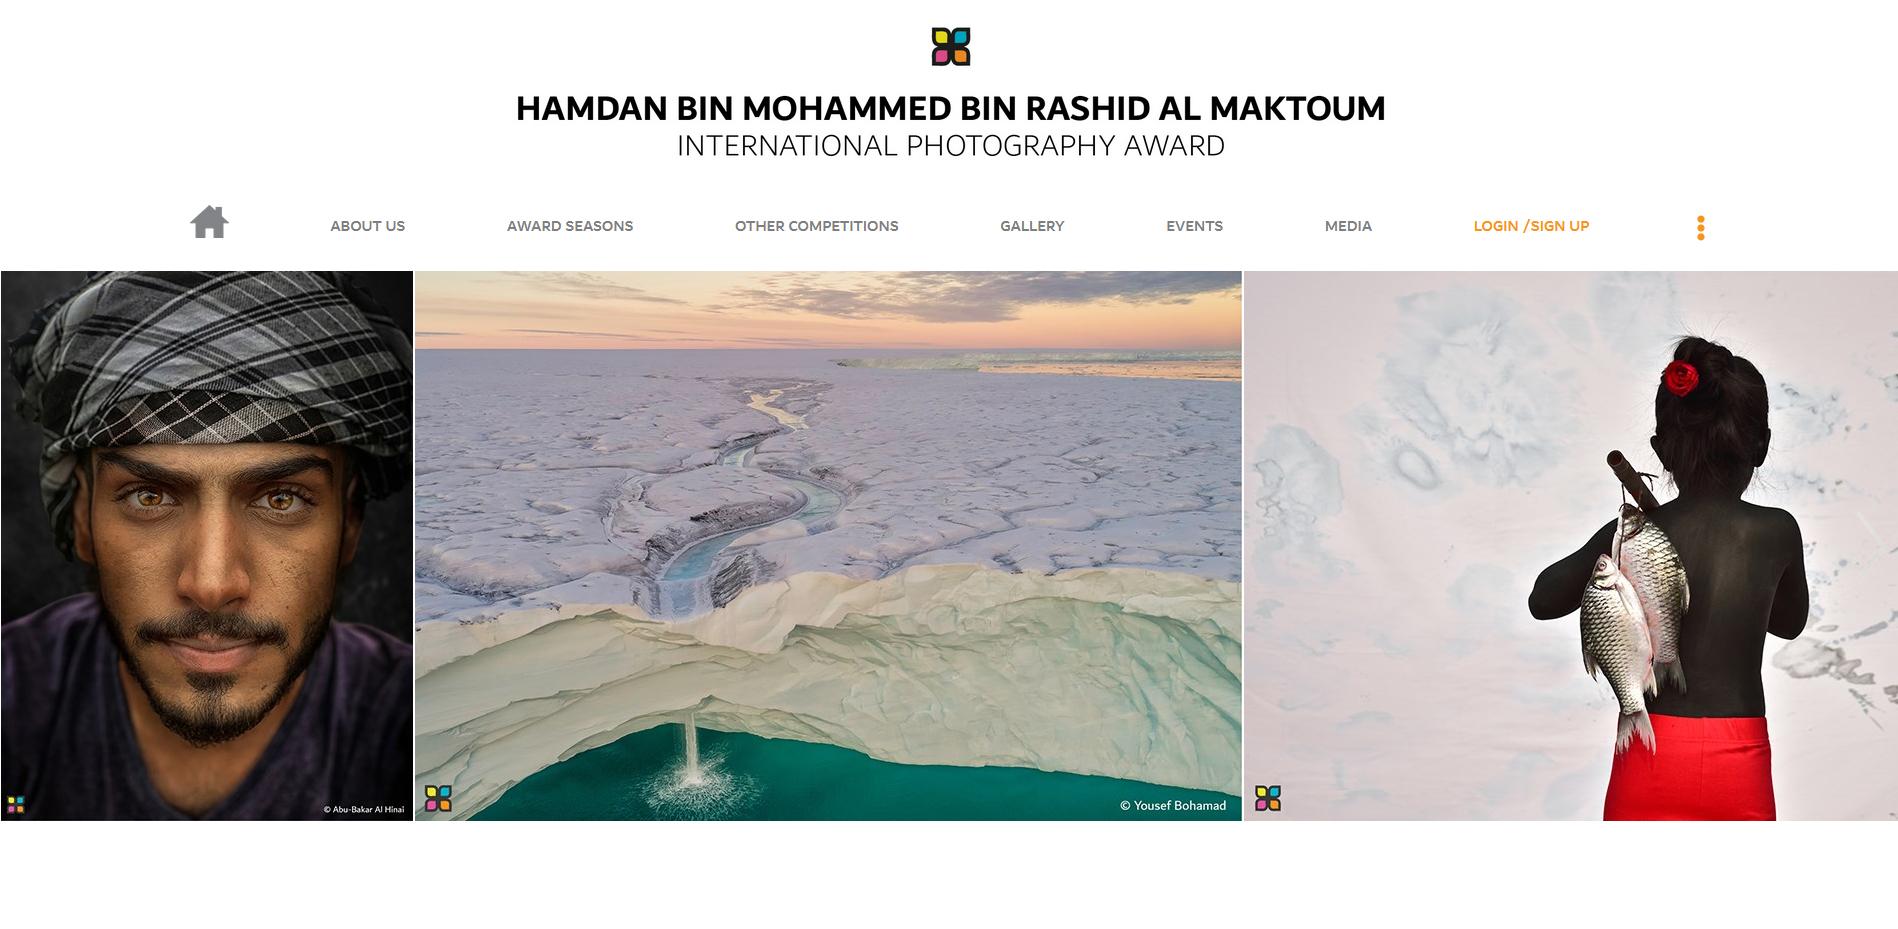 فراخوان رقابت بین المللی عکاسی Hamdan